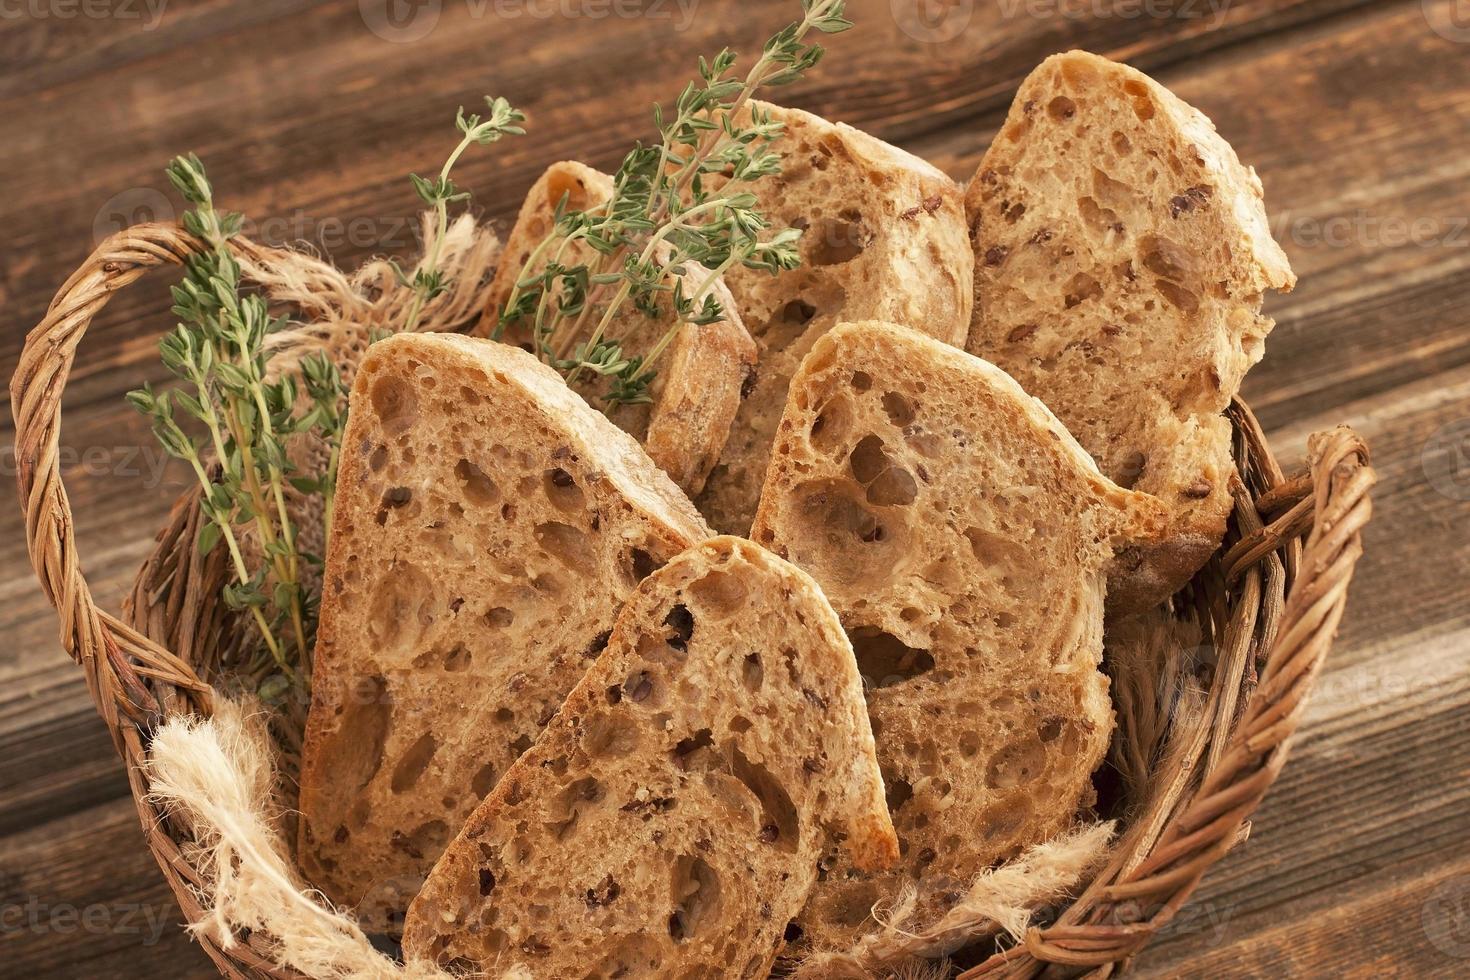 leckeres Baguette im Weidenkorb foto